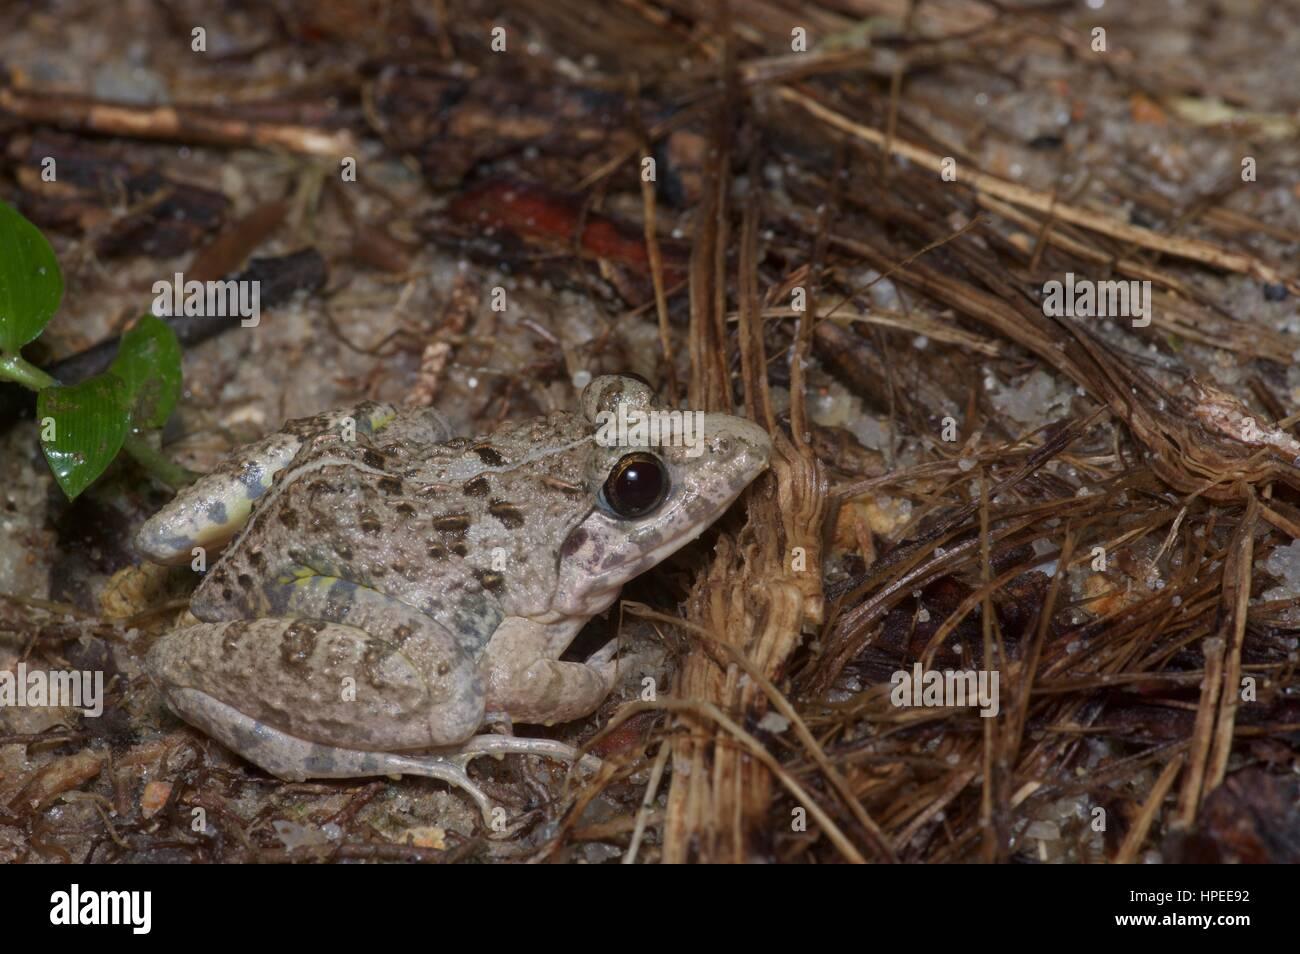 An Asian Grass Frog (Fejervarya limnocharis) in the rainforest at night in Ulu Semenyih, Selangor, Malaysia - Stock Image